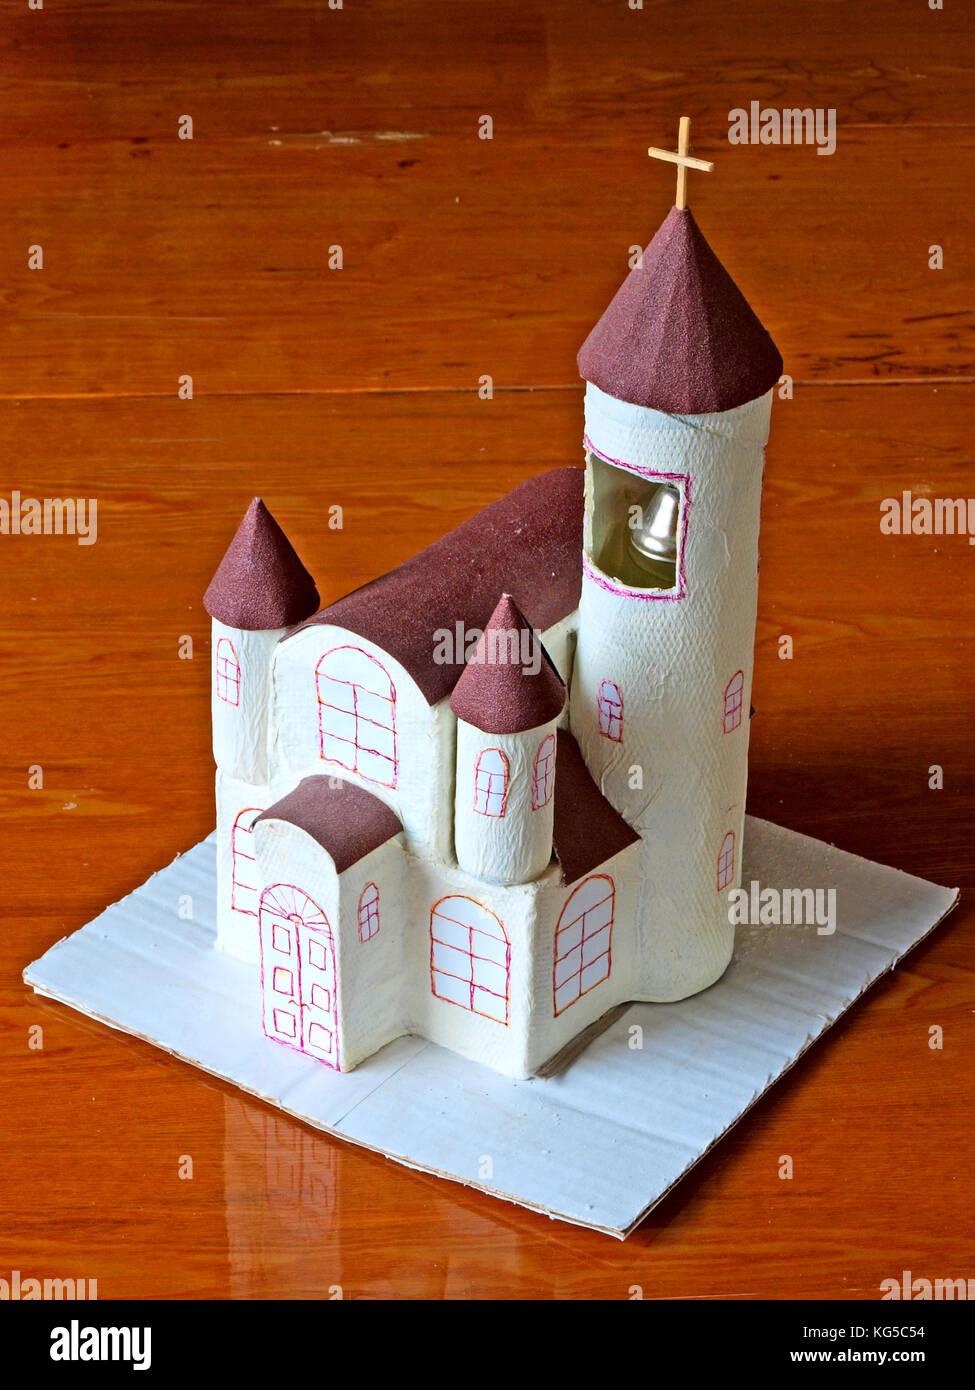 Hausgemachte einfaches Papier Modell der Kirche Stockbild